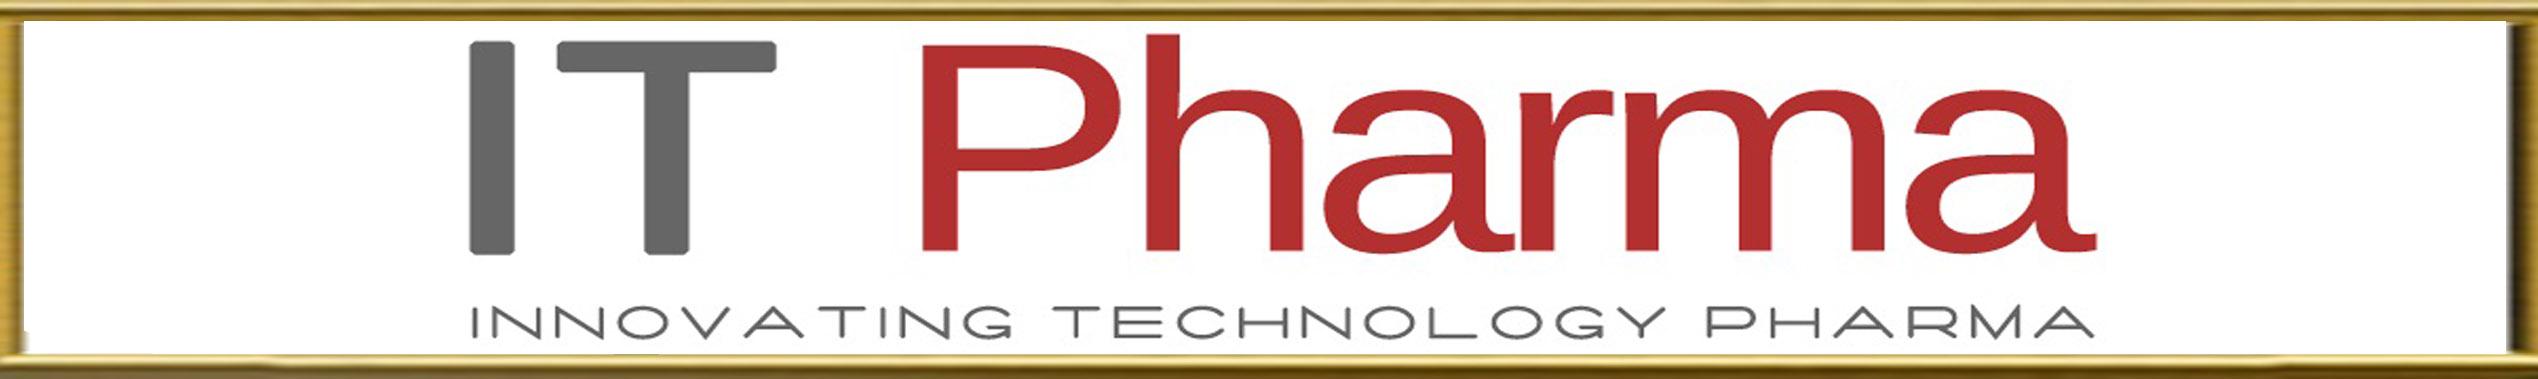 it-pharma-_logo